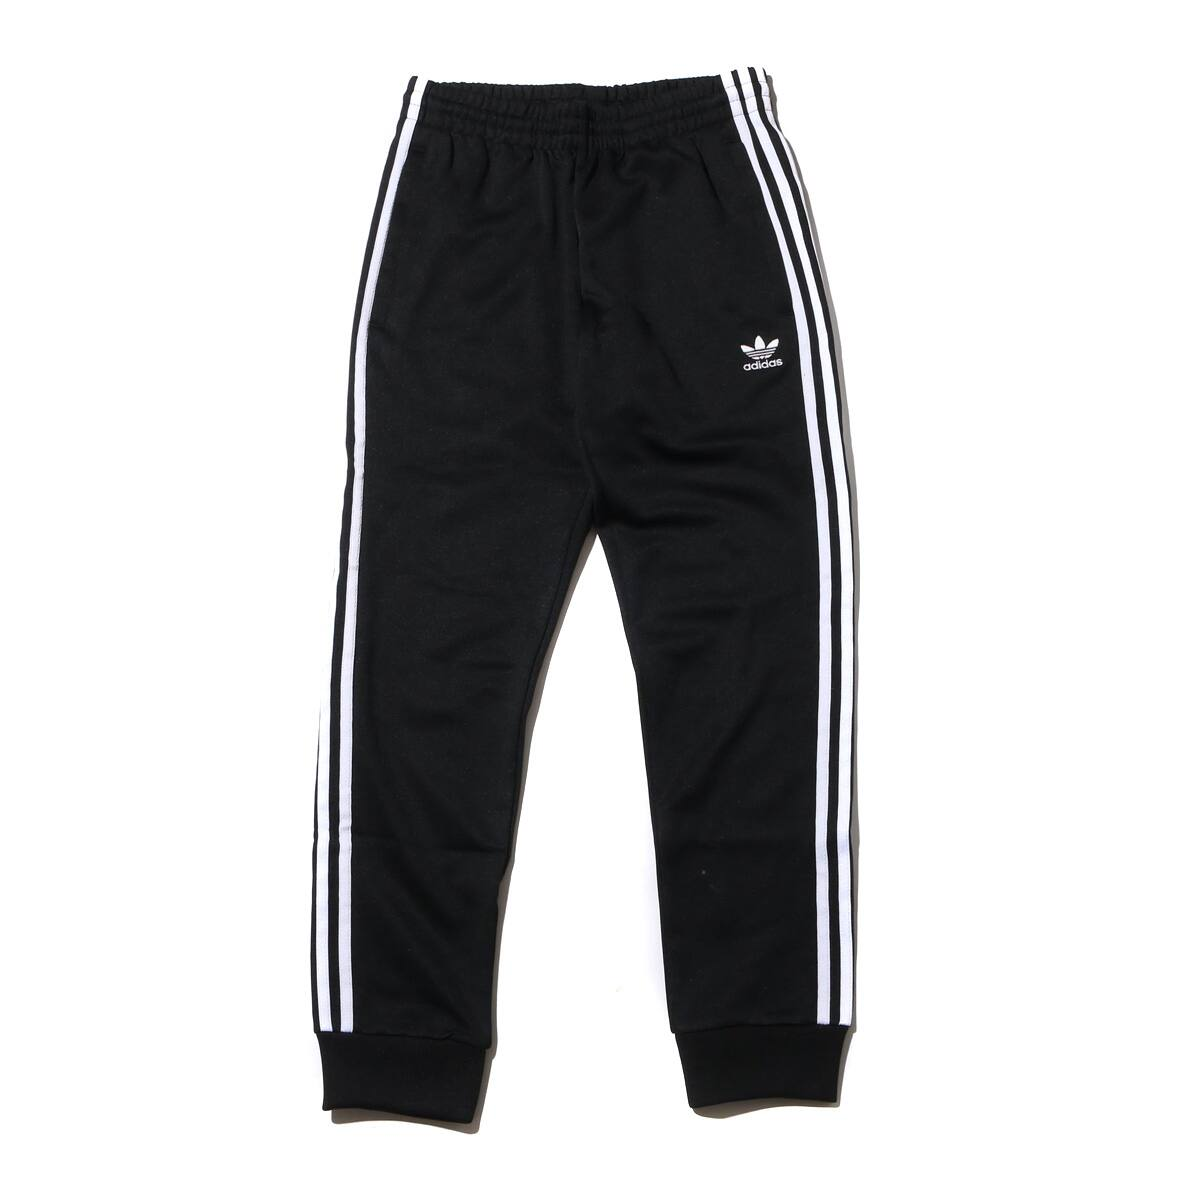 adidas Originals SST TRACK PANTS  Black 19FW-I_photo_large